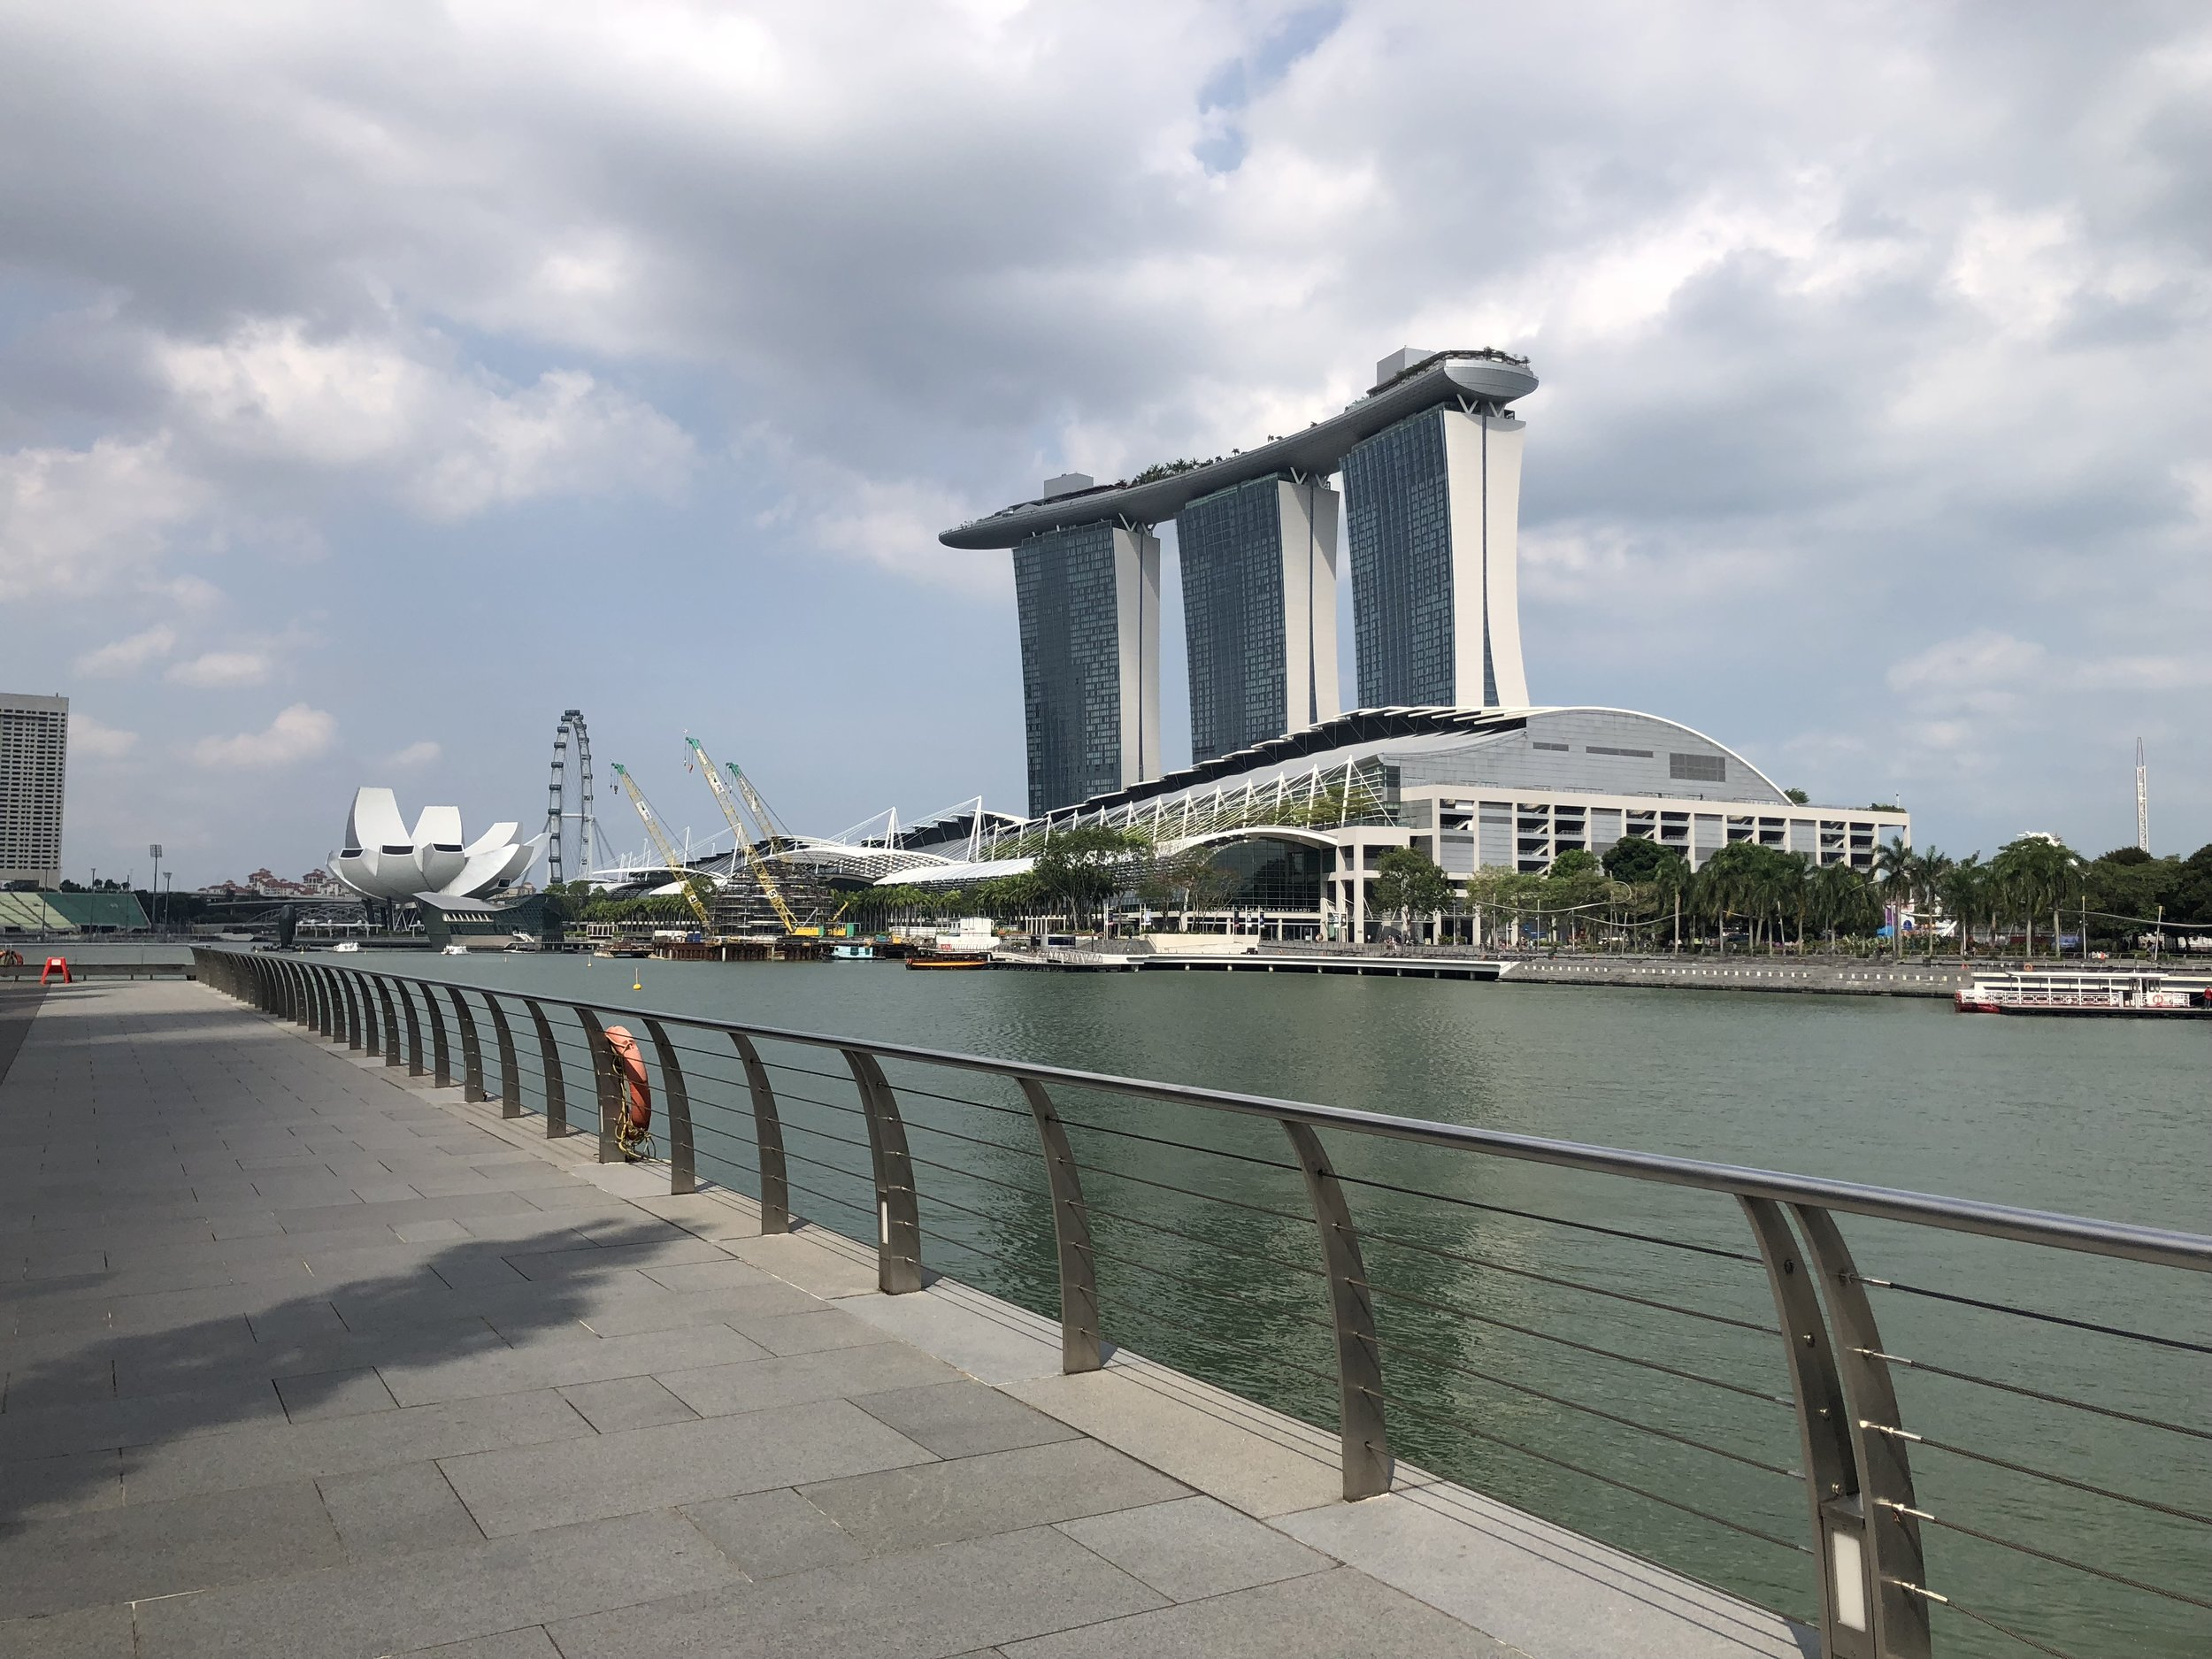 Acercándome al hotel de Marina Bay Sands. Atrás esta Gardens By The Bay, mi destino final.